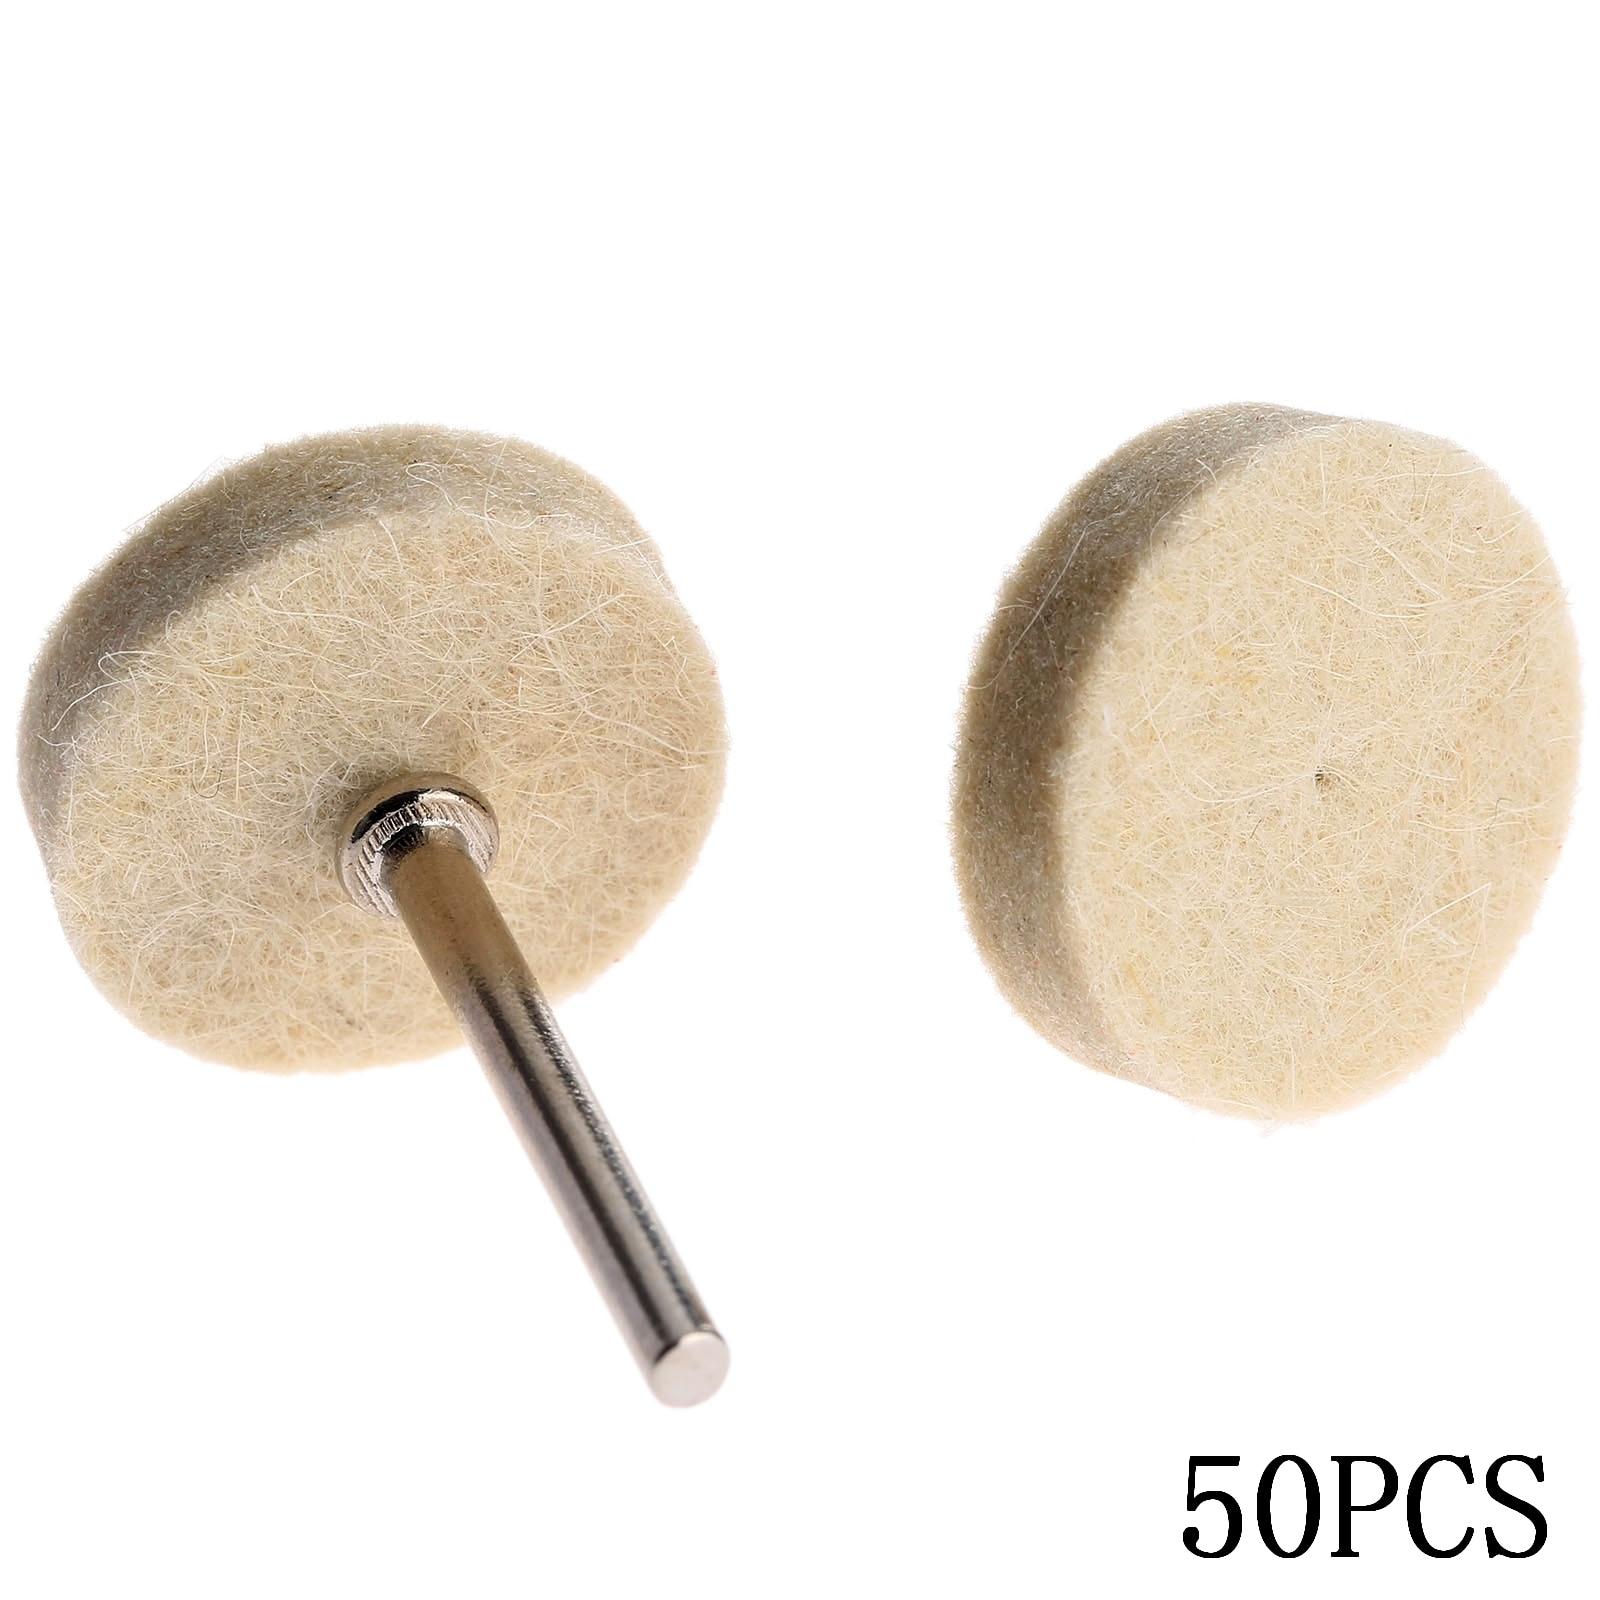 50Pcs 25mm Dremel Accessori Feltro di lana Lucidatura Lucidatura Mola - Utensili abrasivi - Fotografia 4